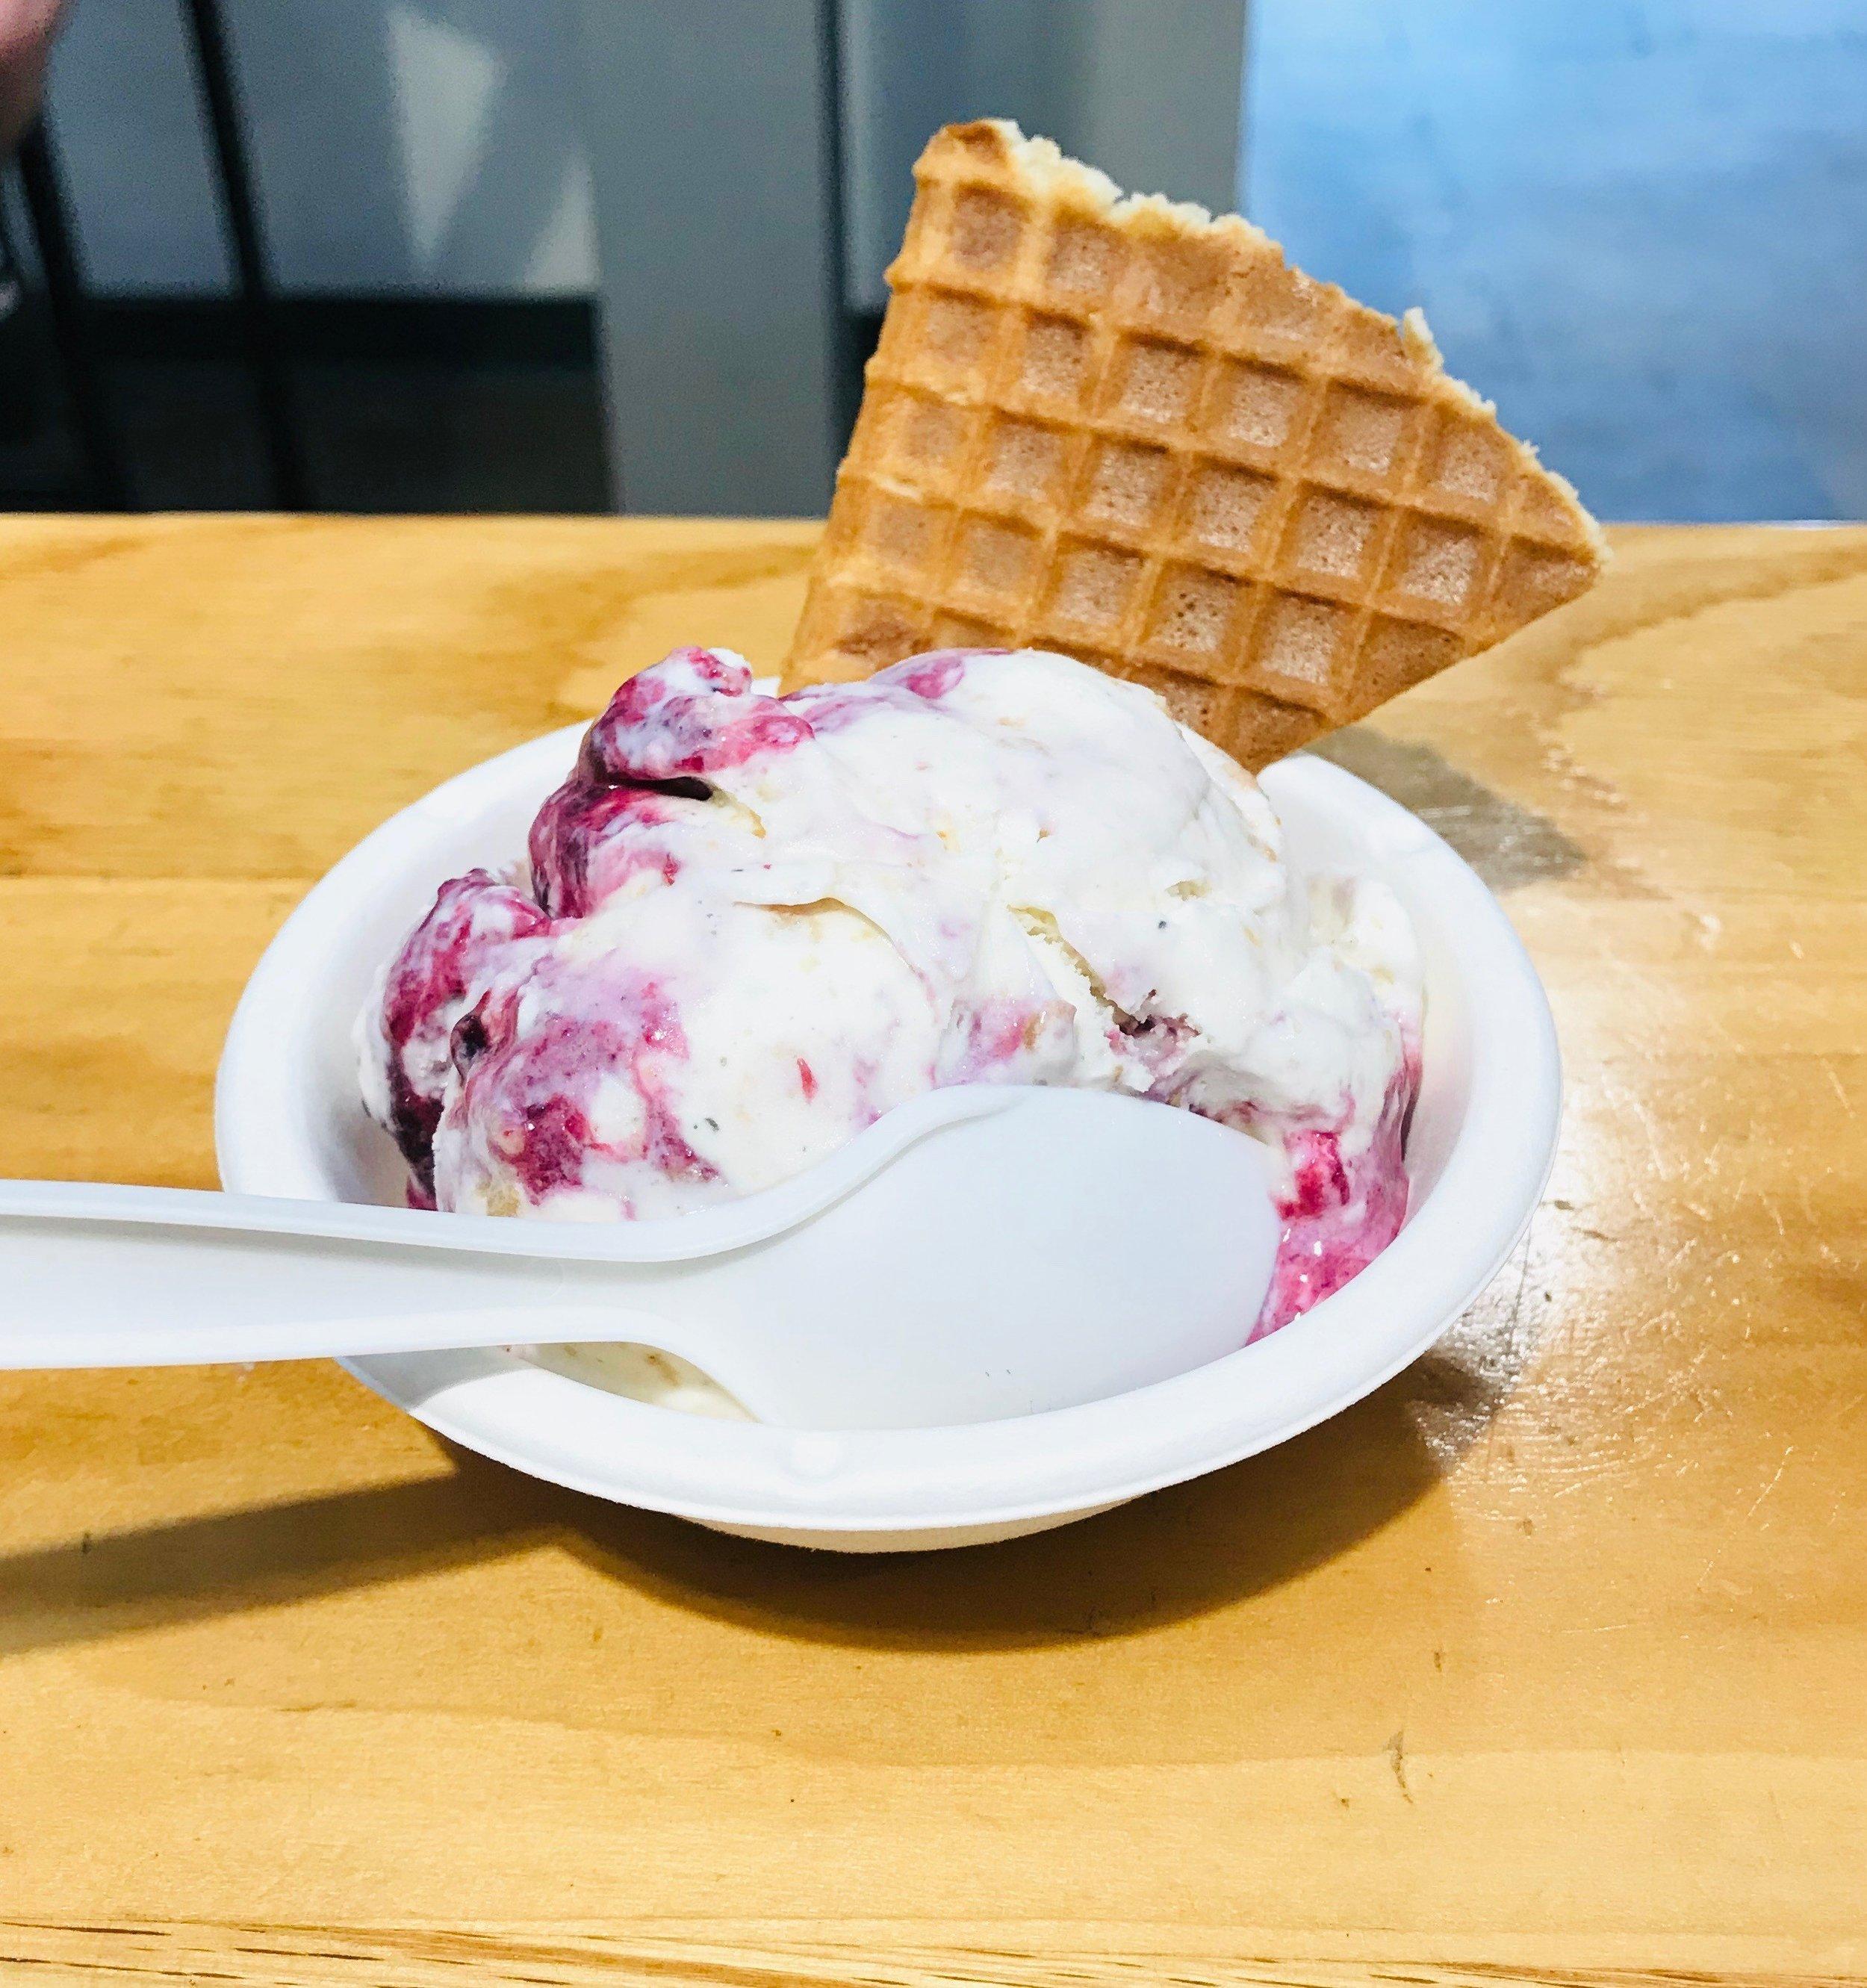 jenis ice cream krog st market.jpg